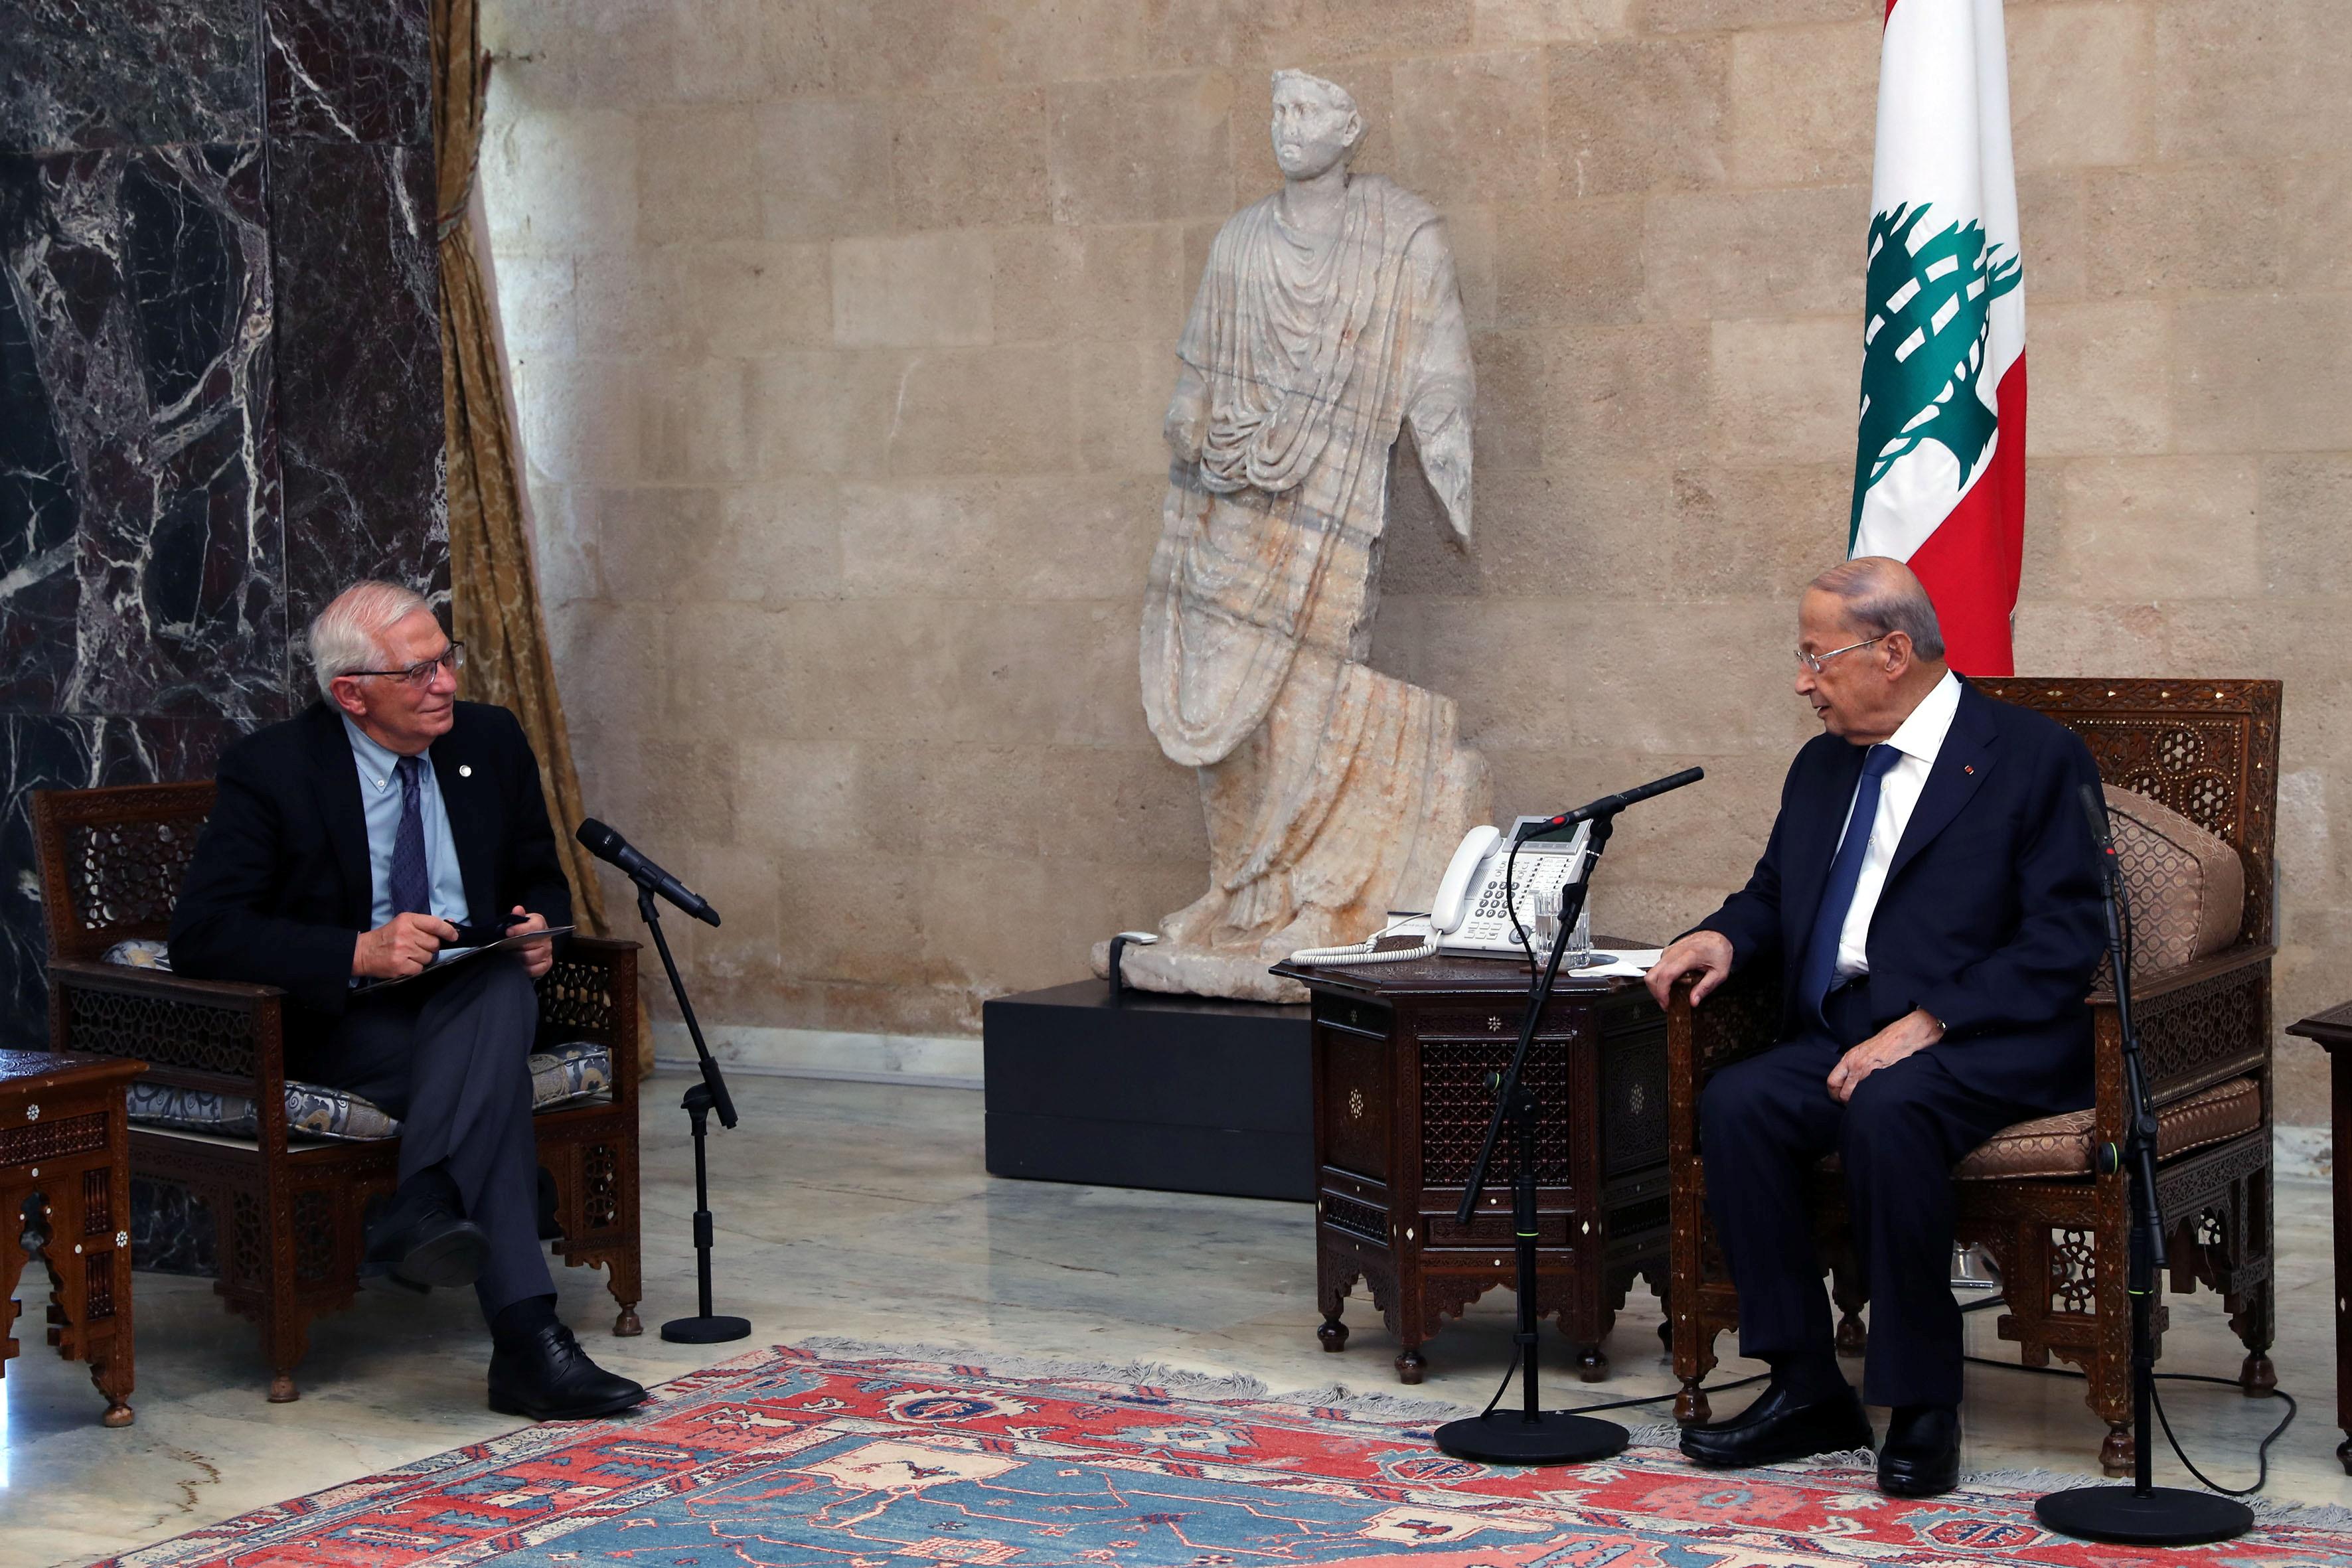 European Union foreign policy chief Josep Borrell meets with Lebanon's President Michel Aoun at the presidential palace in Baabda, Lebanon June 19, 2021. Dalati Nohra/Handout via REUTERS